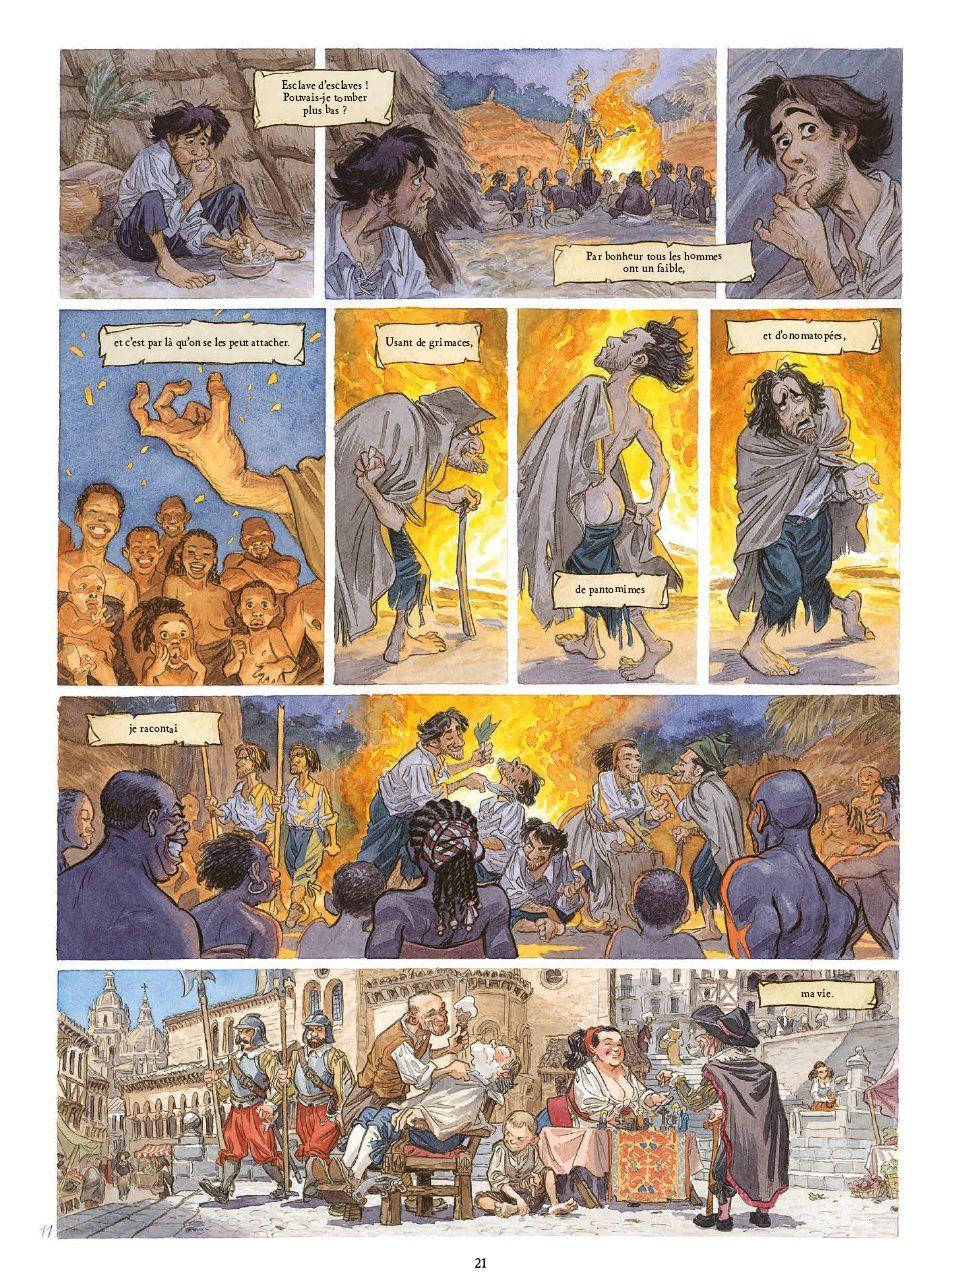 #JuanjoGuarnido, #AlainAyroles #Blacksadmania, #Collaboration, #Lesindesfourbes, #EditionsDelcourt, #28Août2019, #BDGest